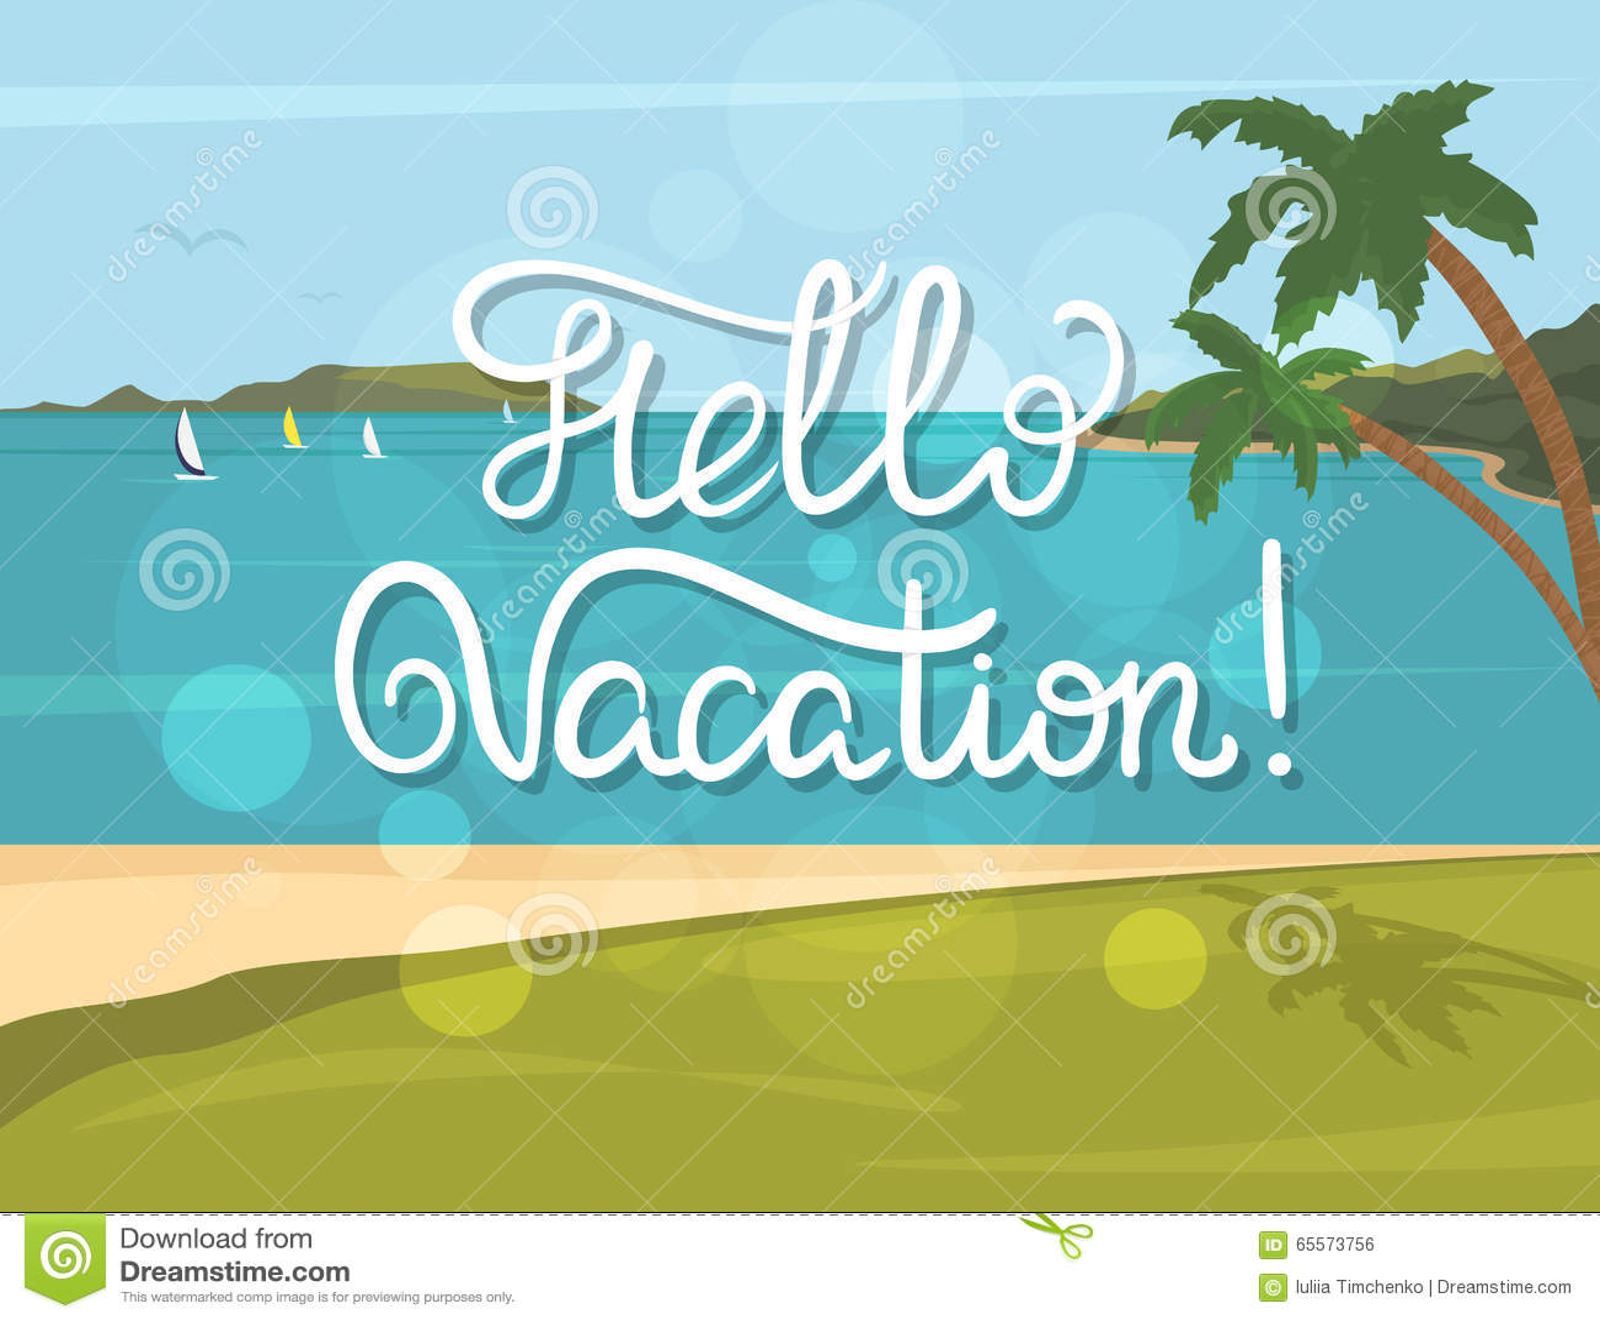 Hello Vacation Banner Stock Vector. Illustration Of